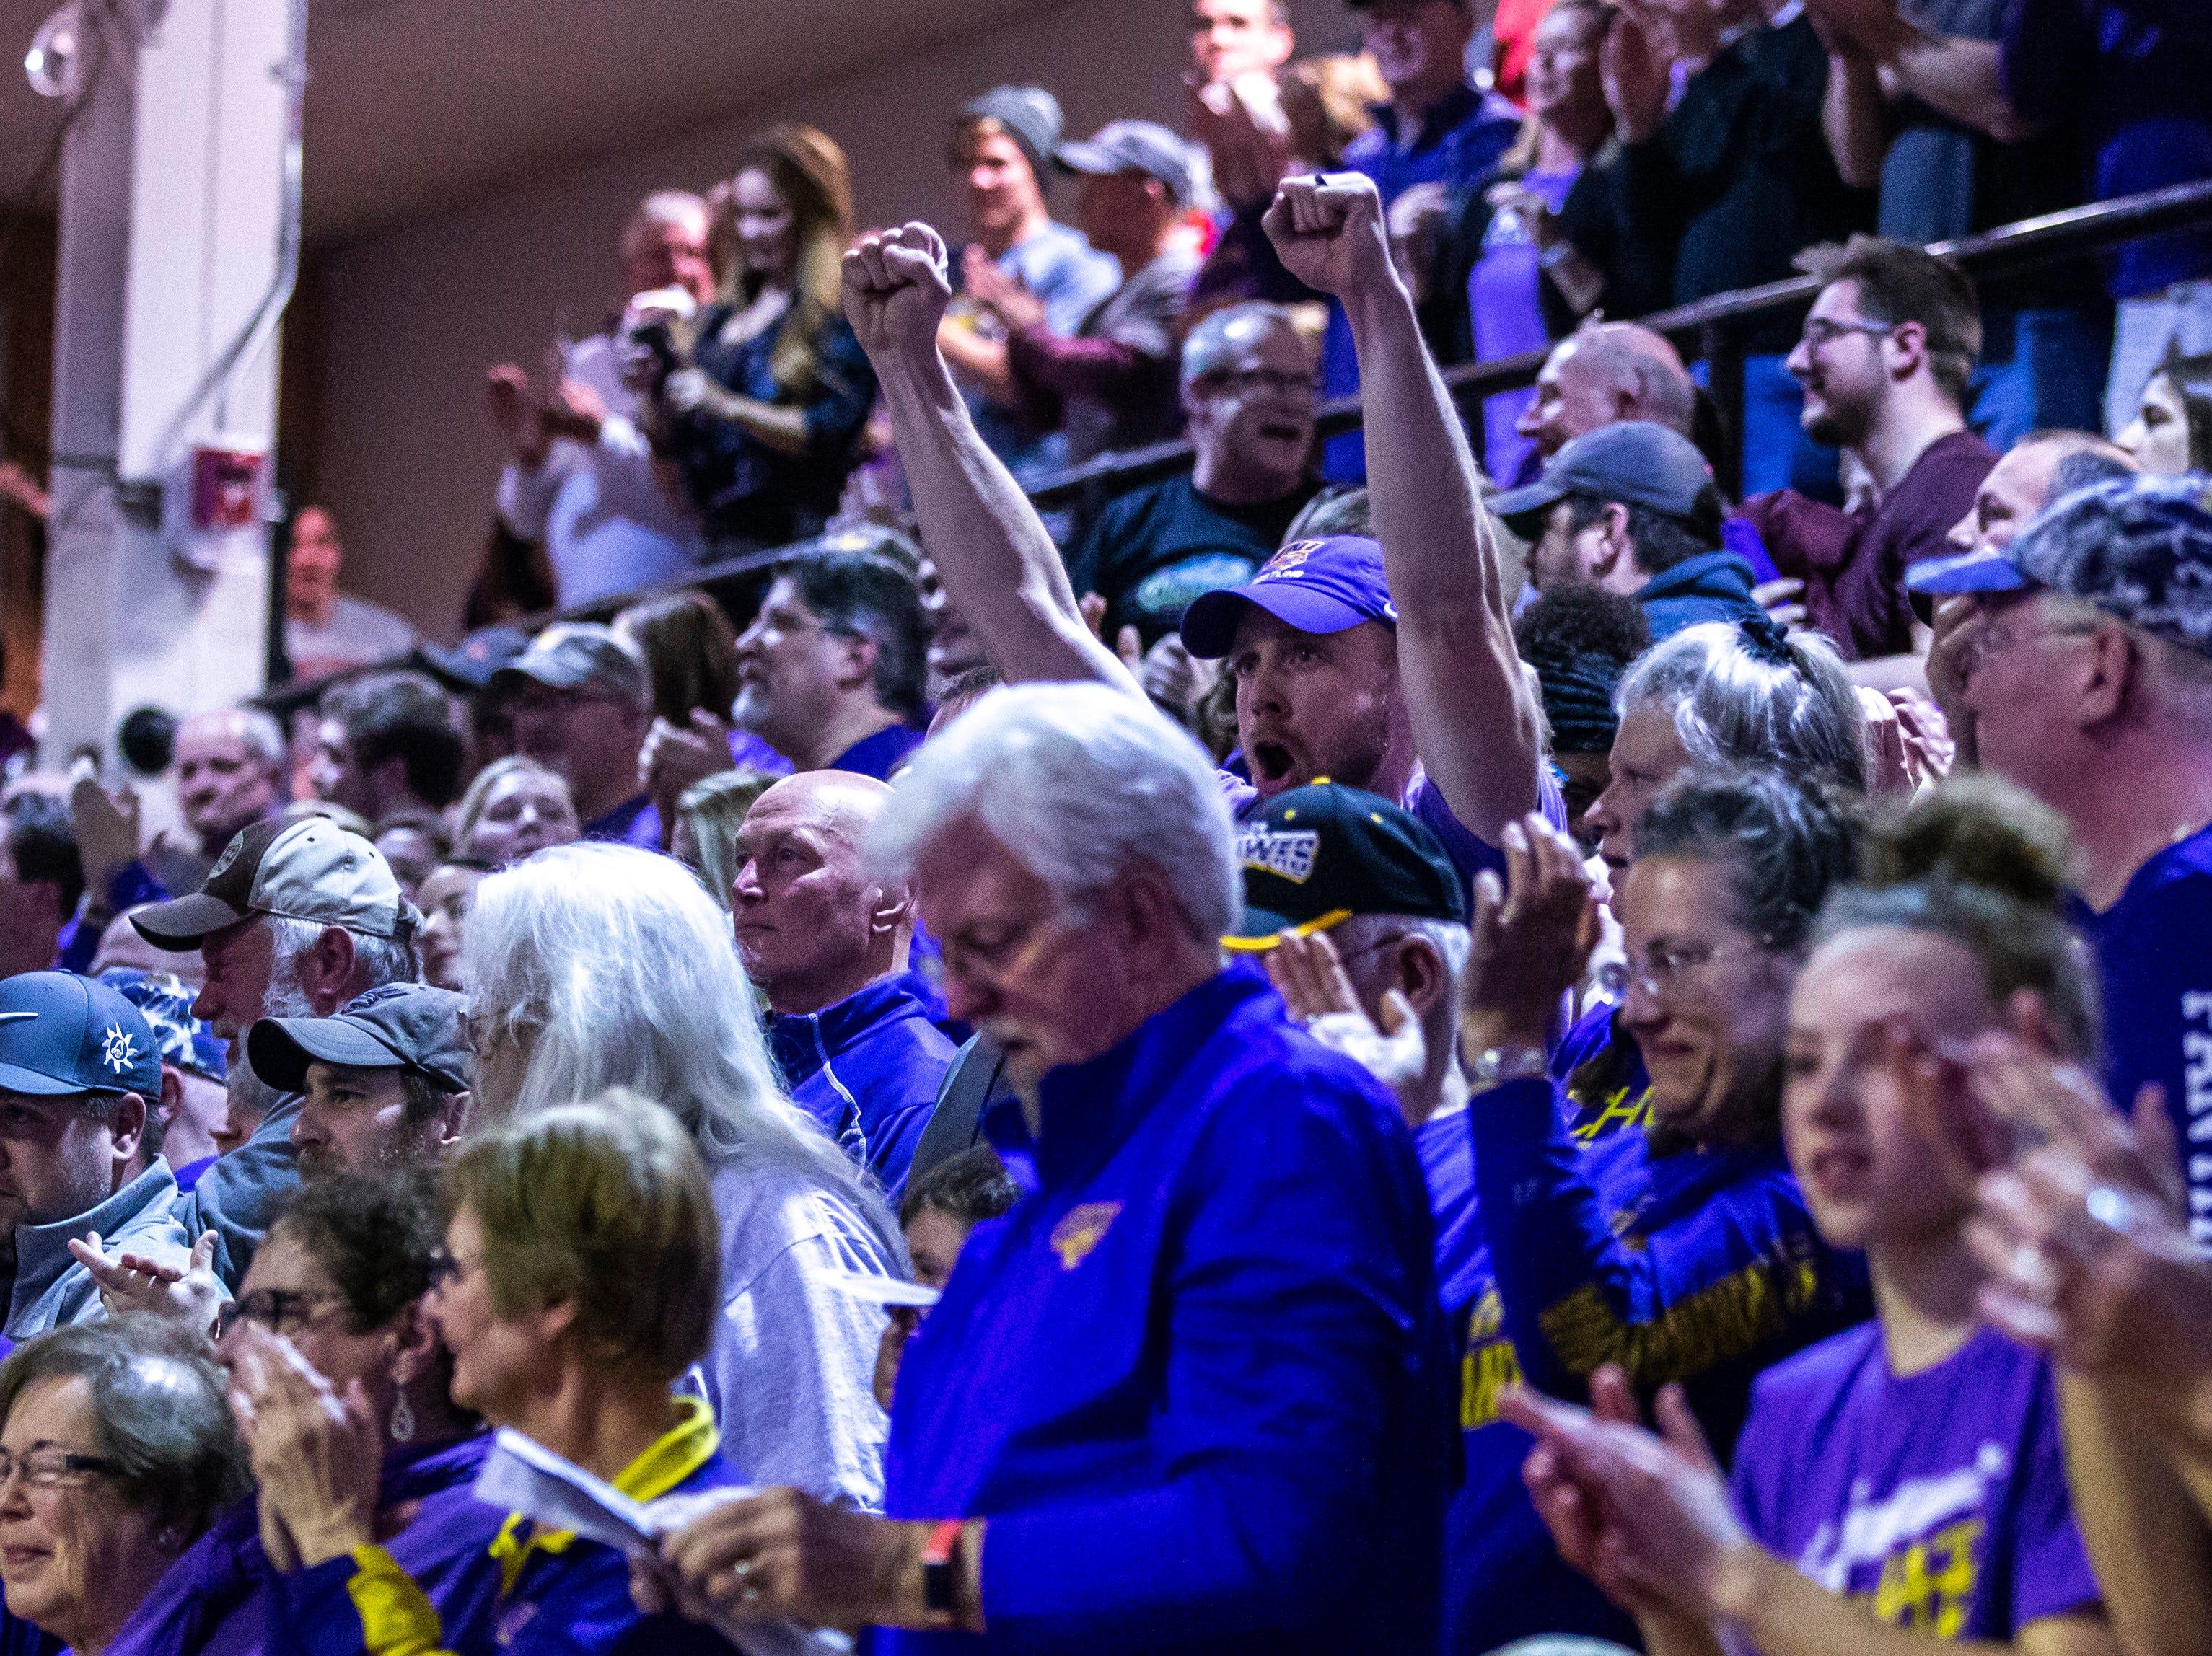 Northern Iowa fans cheer during a NCAA Big 12 wrestling dual on Thursday, Feb. 21, 2019 at the West Gymnasium in Cedar Falls, Iowa.